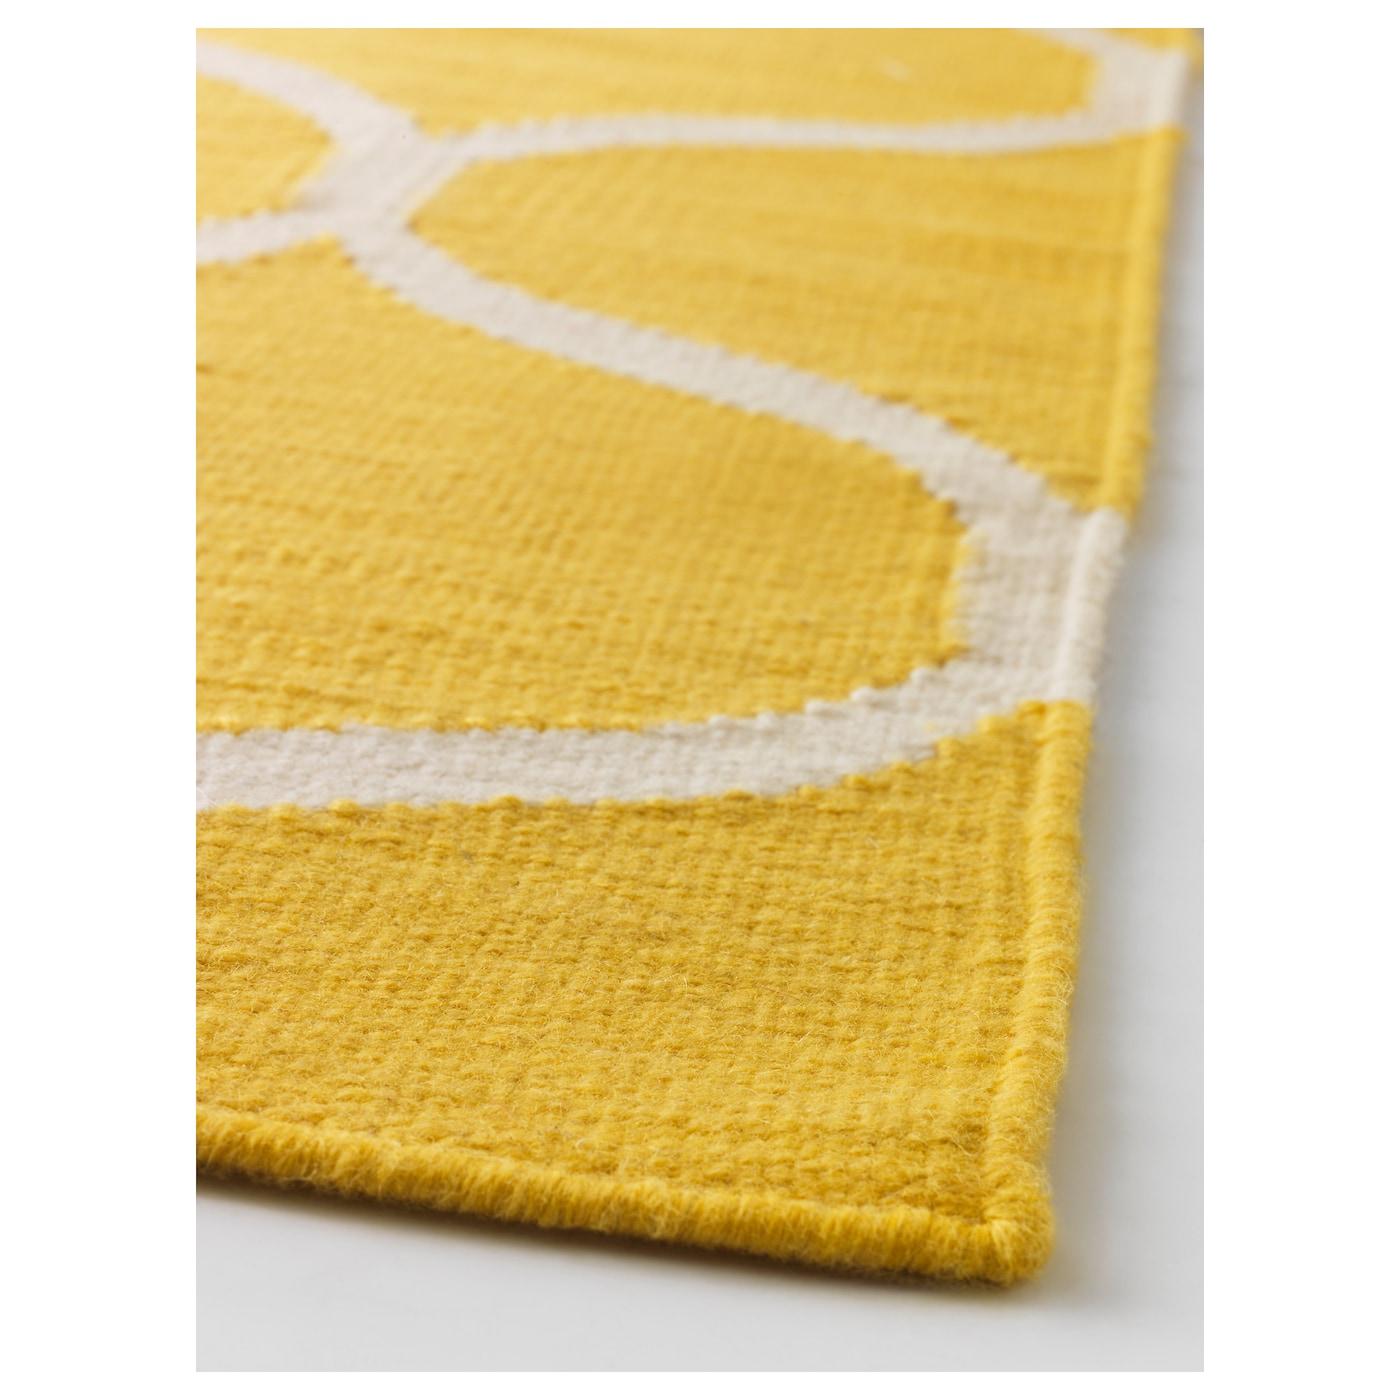 Stockholm Rug Flatwoven Handmade Net Pattern Yellow 170 X